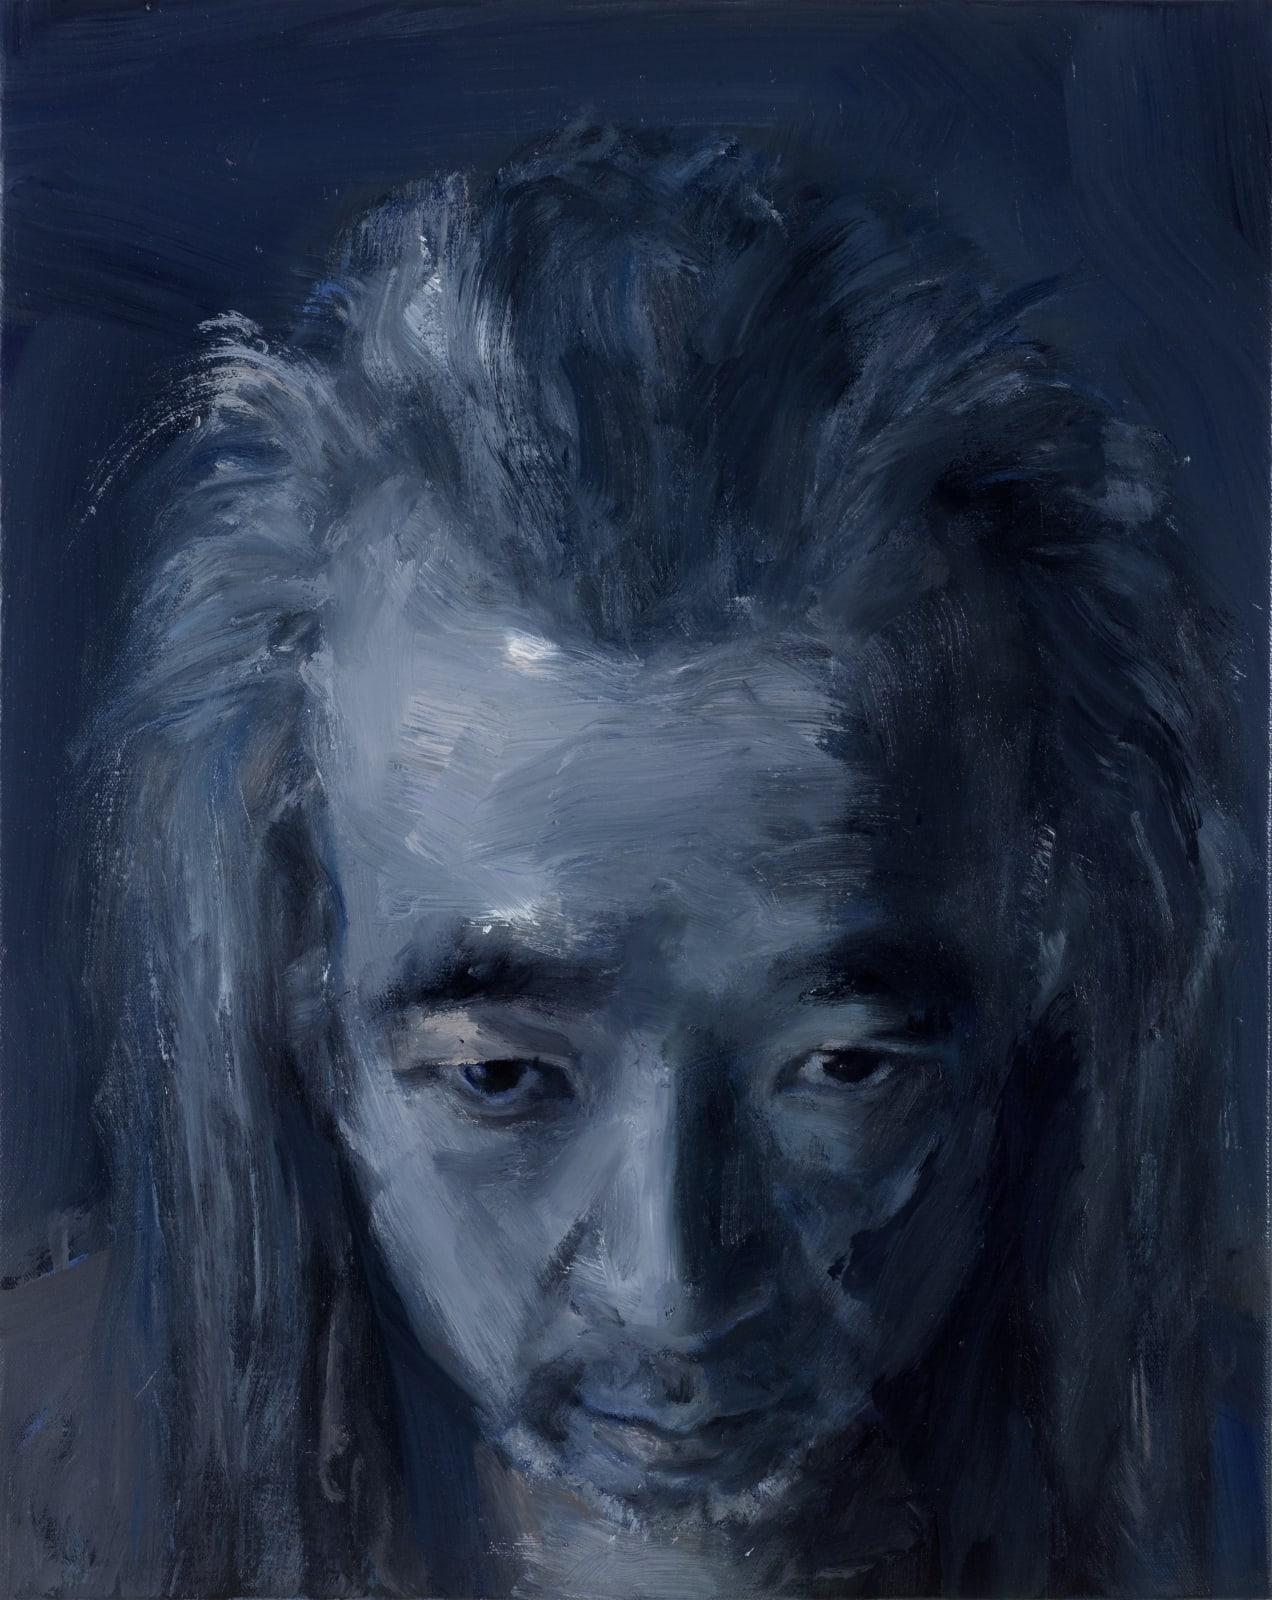 L'artiste franco-chinois Yan Pei-Ming, Thaddaeus Ropac Paris